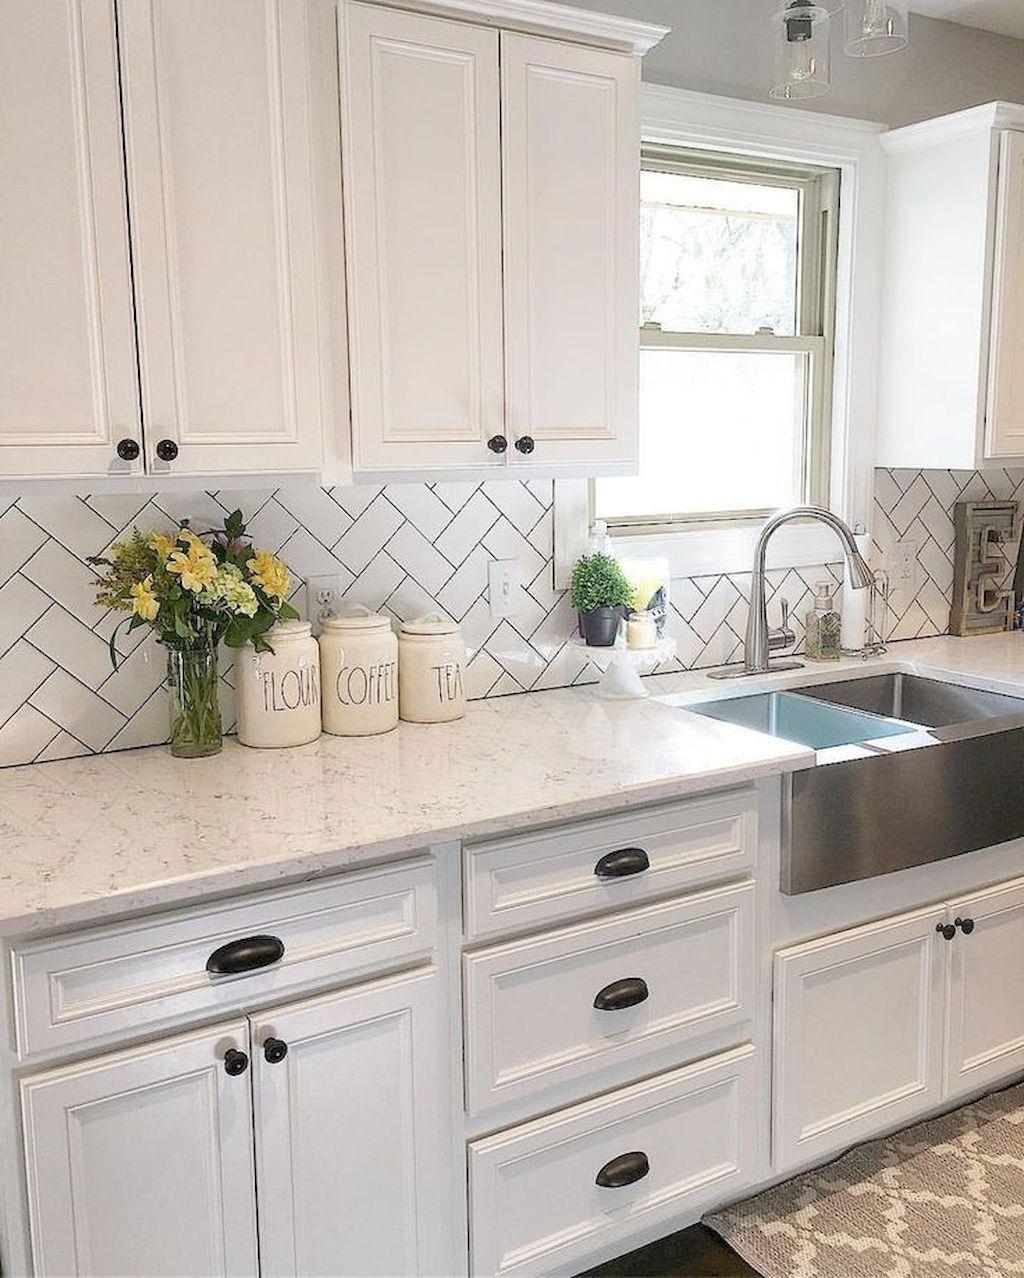 50 Beautiful Kitchen Backsplash Decor Ideas Kitchen Cabinets